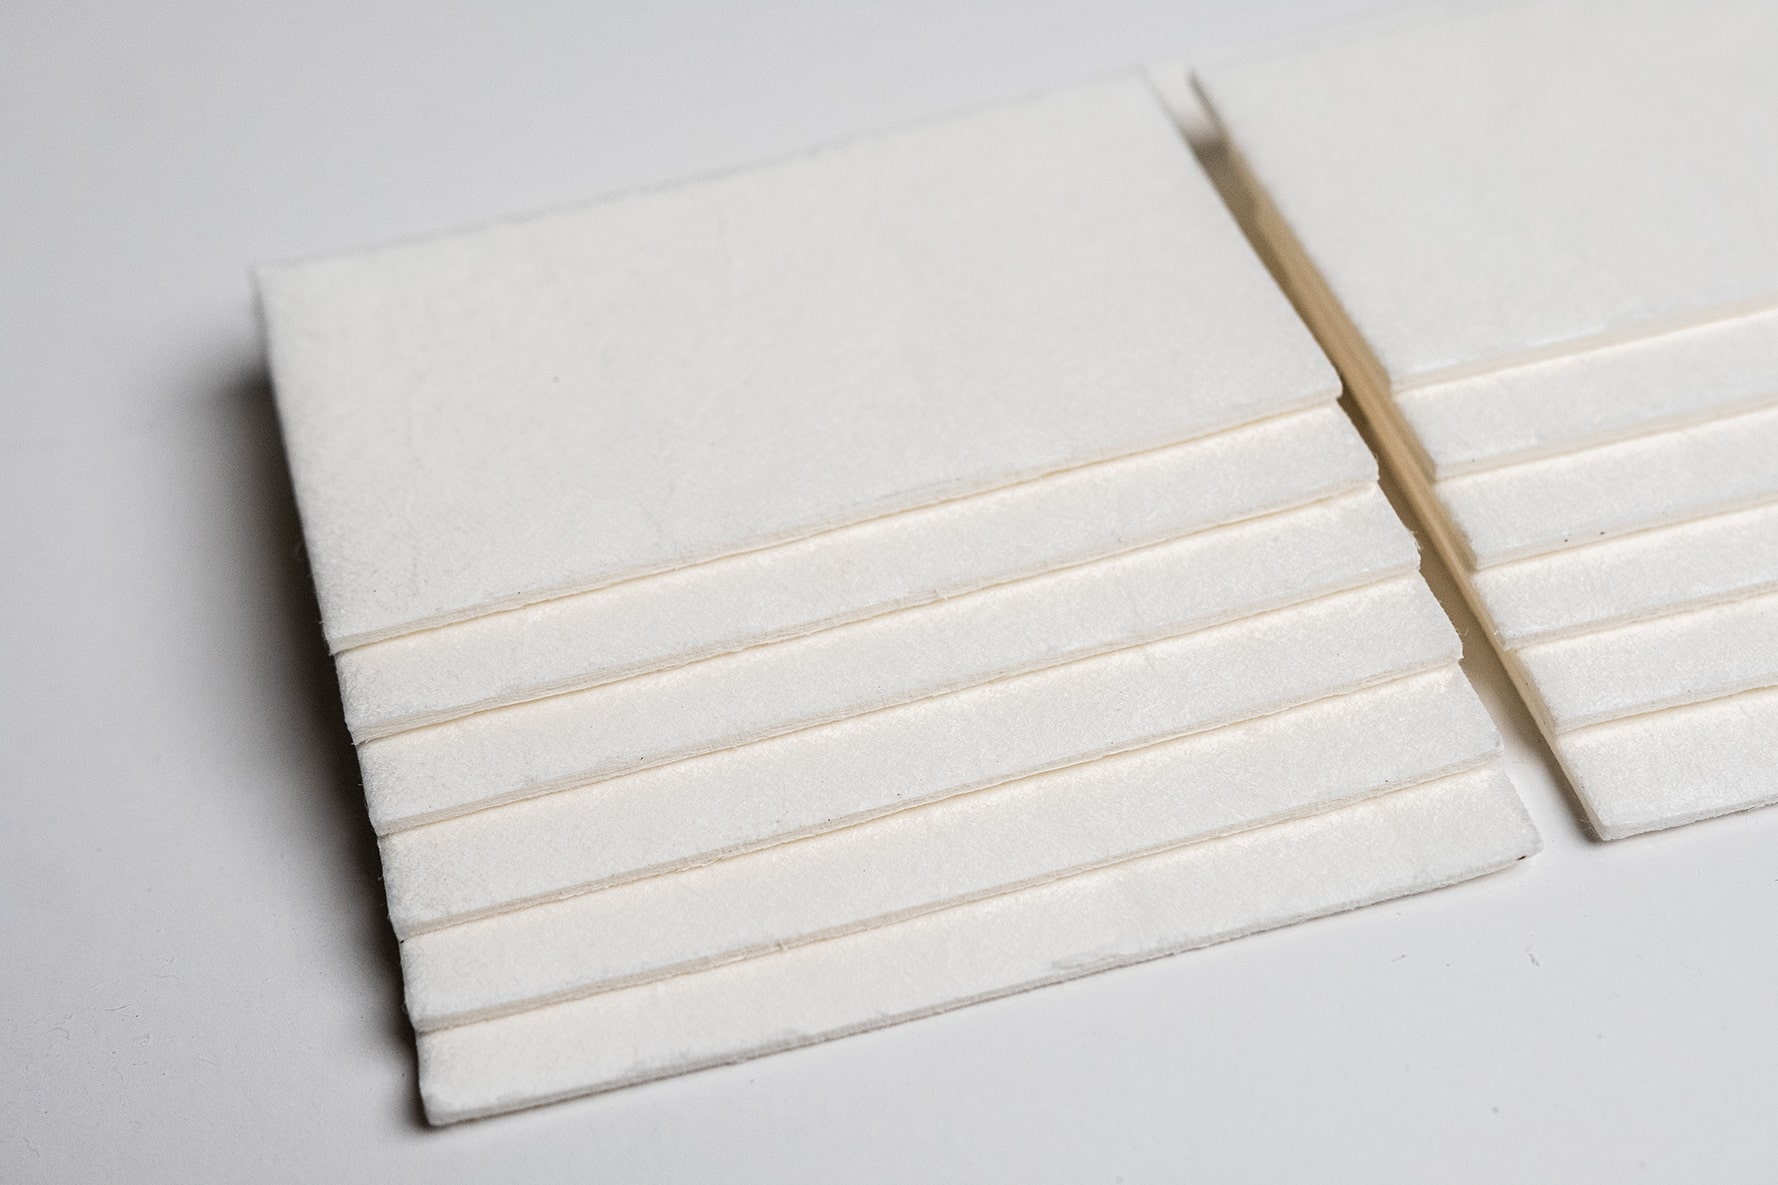 Absorbent Paper - Blotting Paper